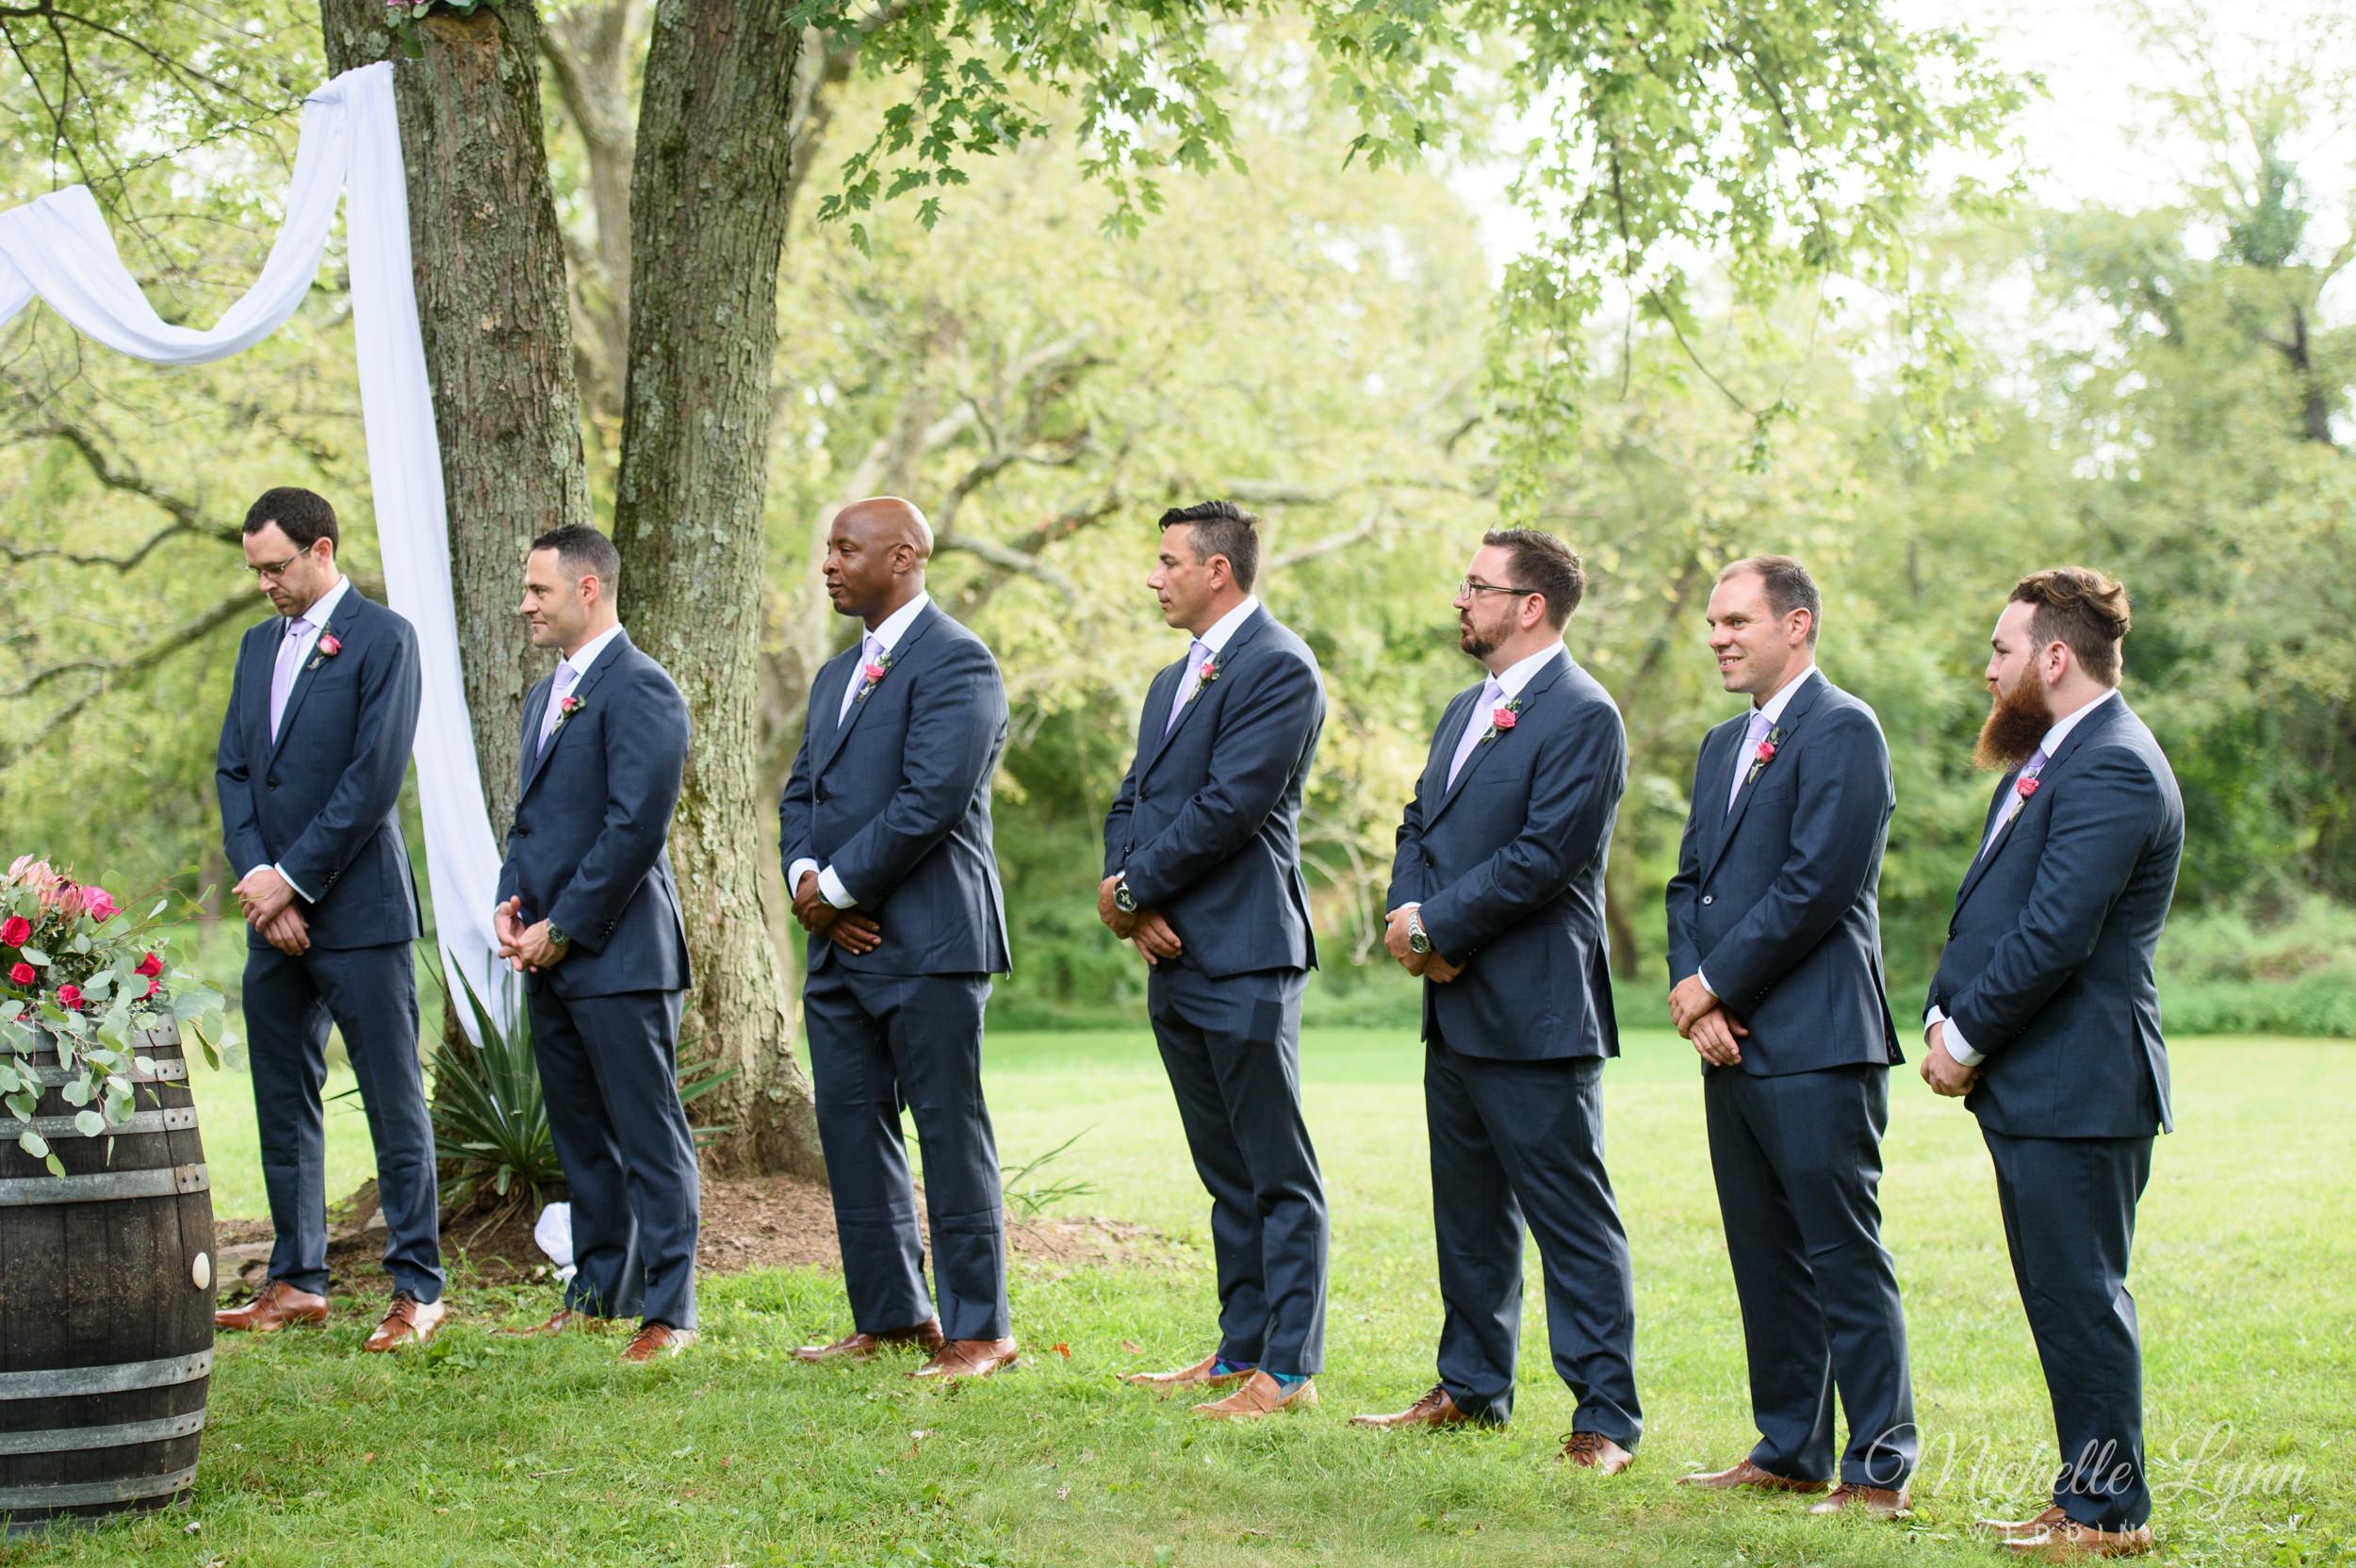 mlw-unionville-vineyards-nj-wedding-photography-39.jpg